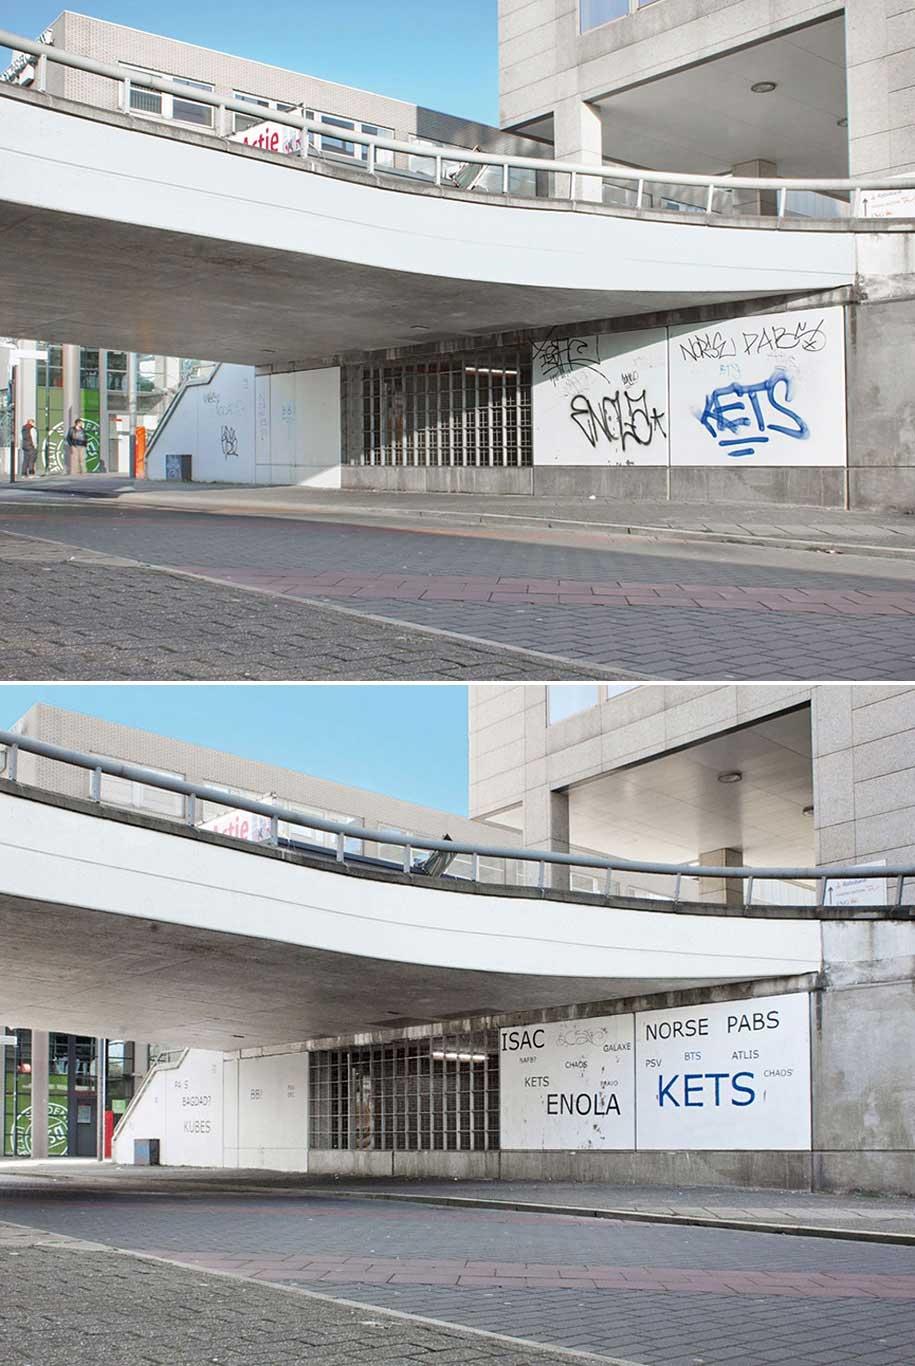 Mathieu Tremblin macht Graffiti-Tags leserlich Mathieu-Tremblin-tag-clouds-graffiti_07